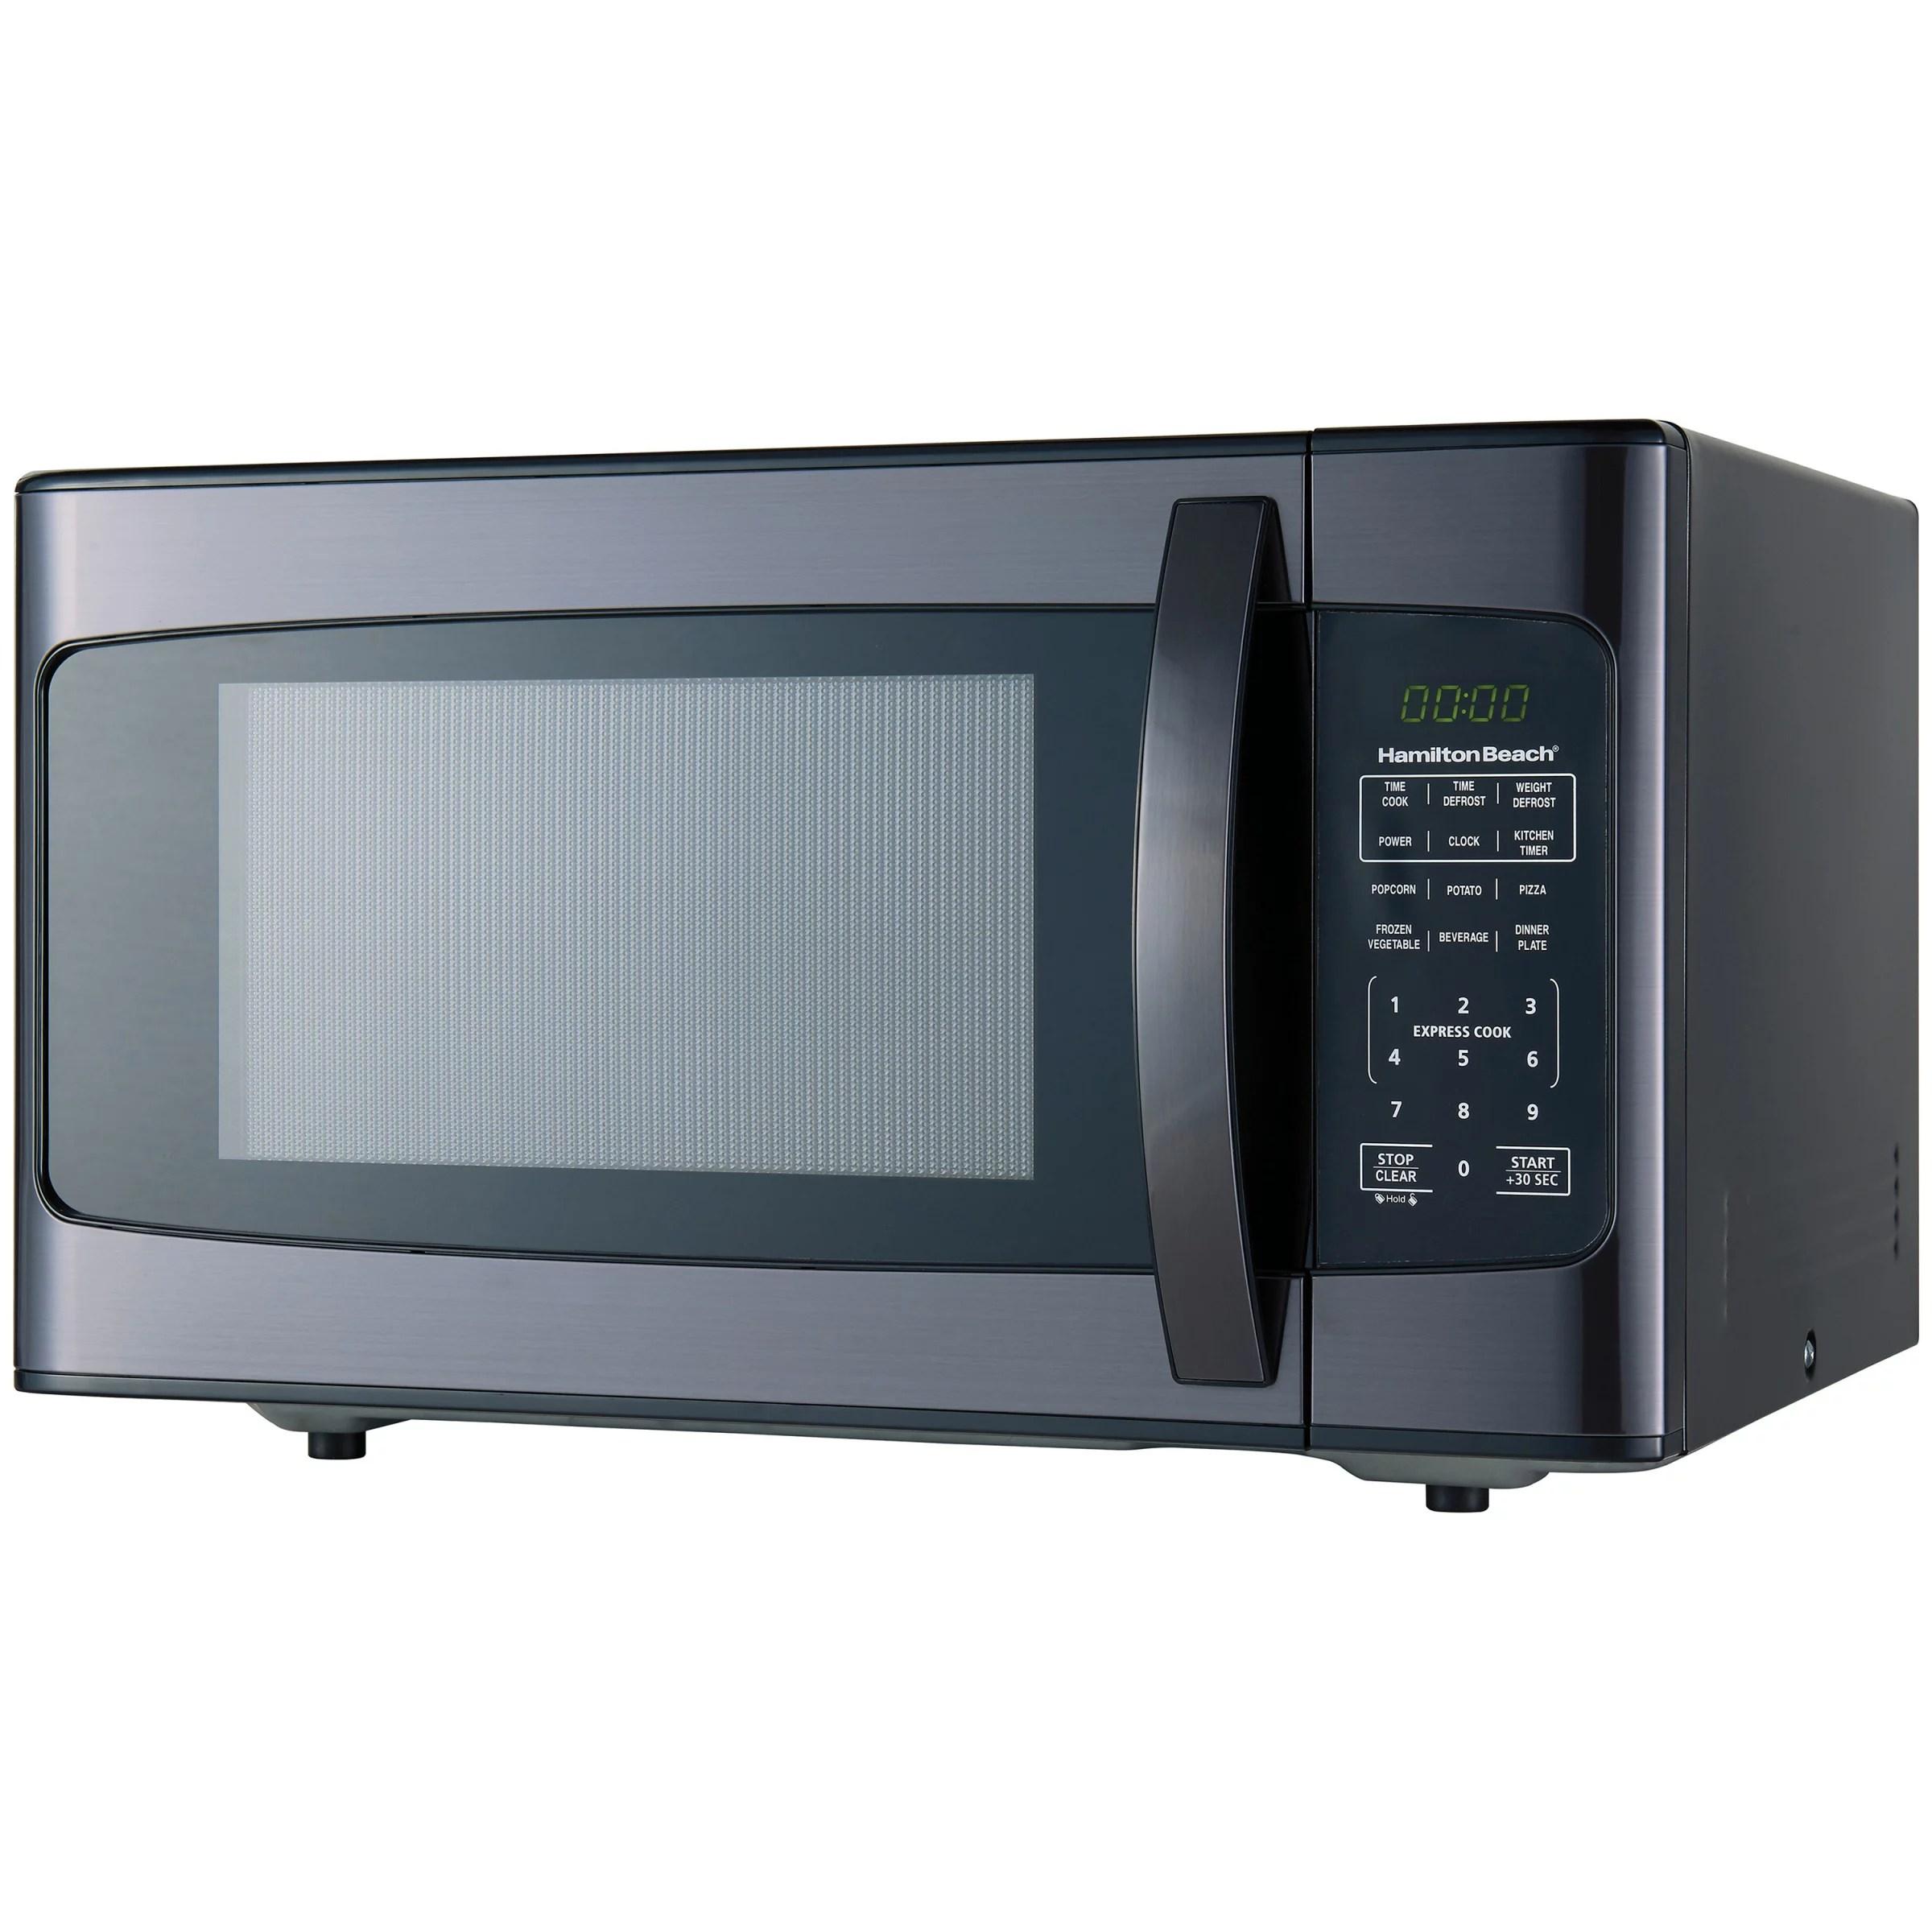 hamilton beach 1 1 cu ft 1000w black stainless steel microwave walmart com